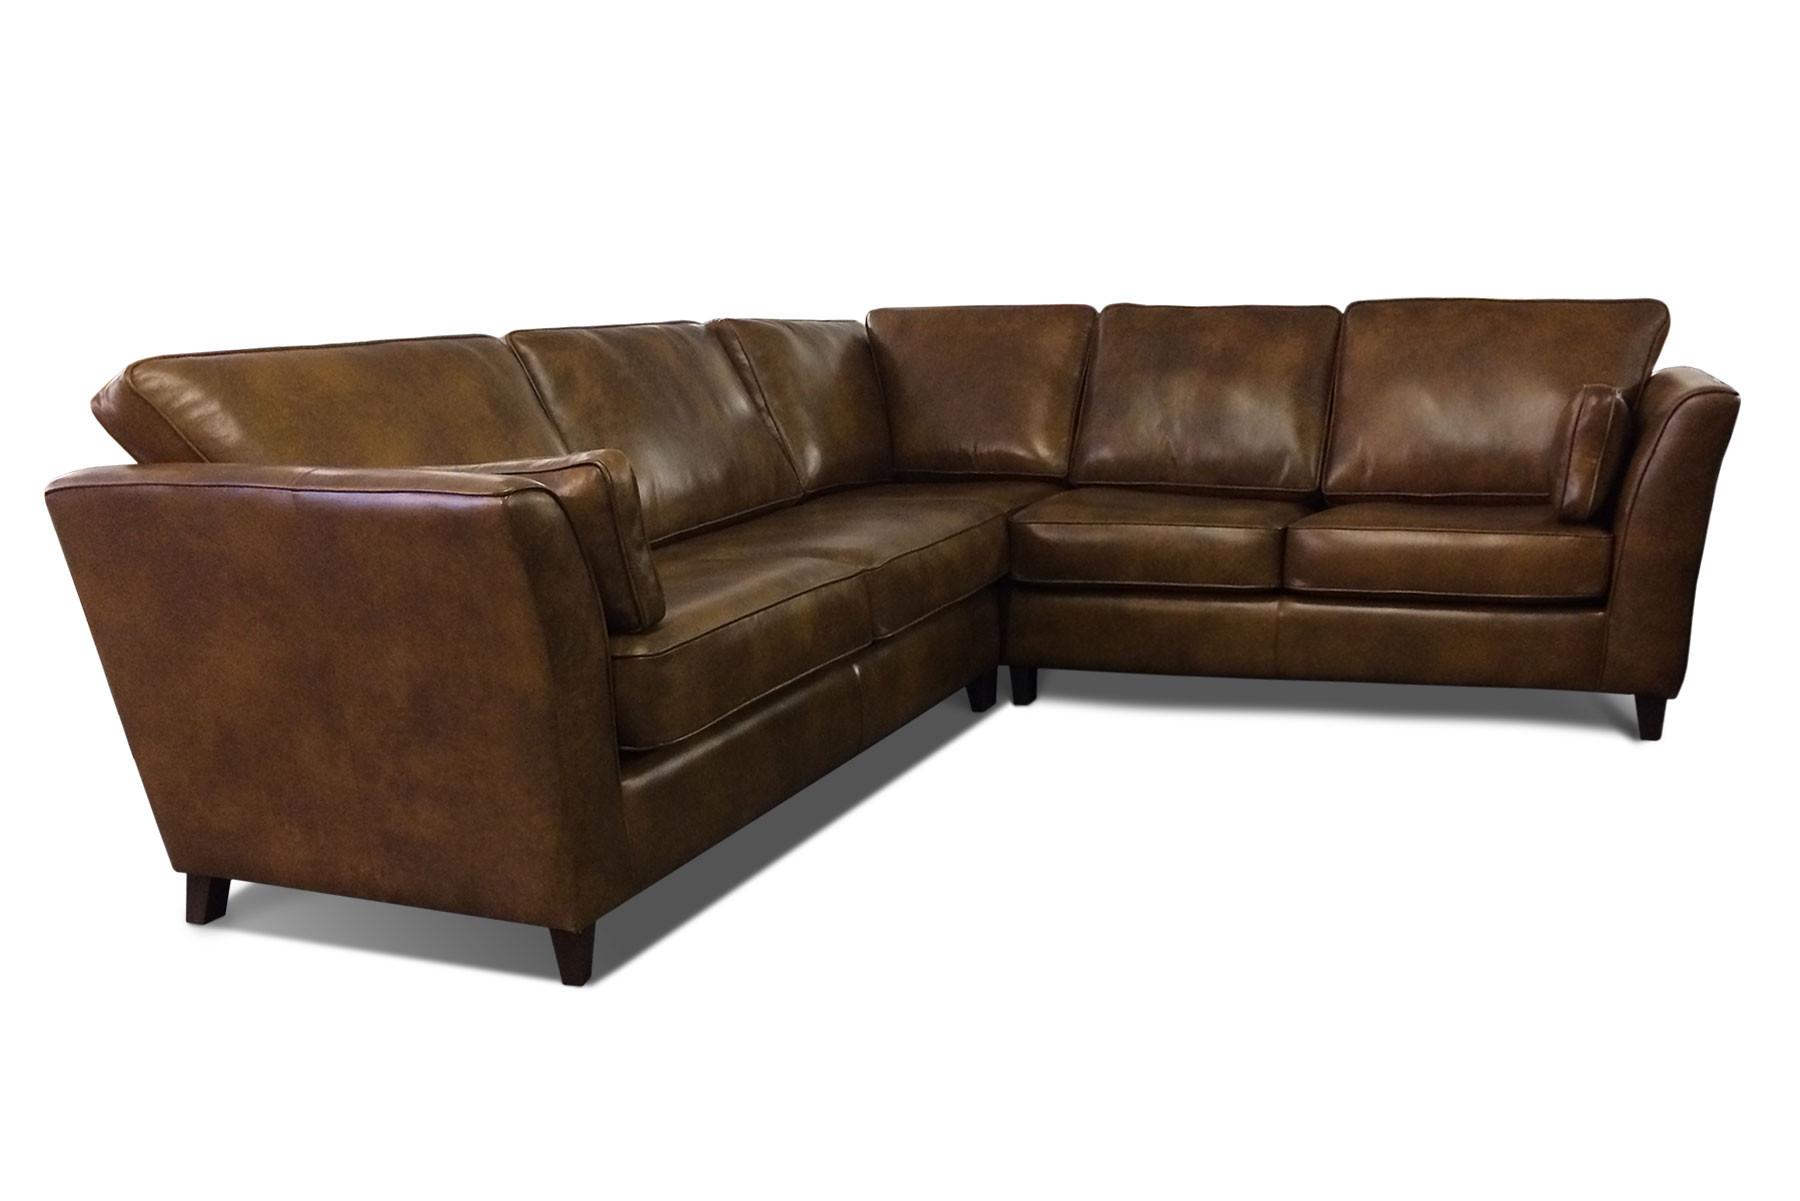 Melbourne Corner Sofa Bed